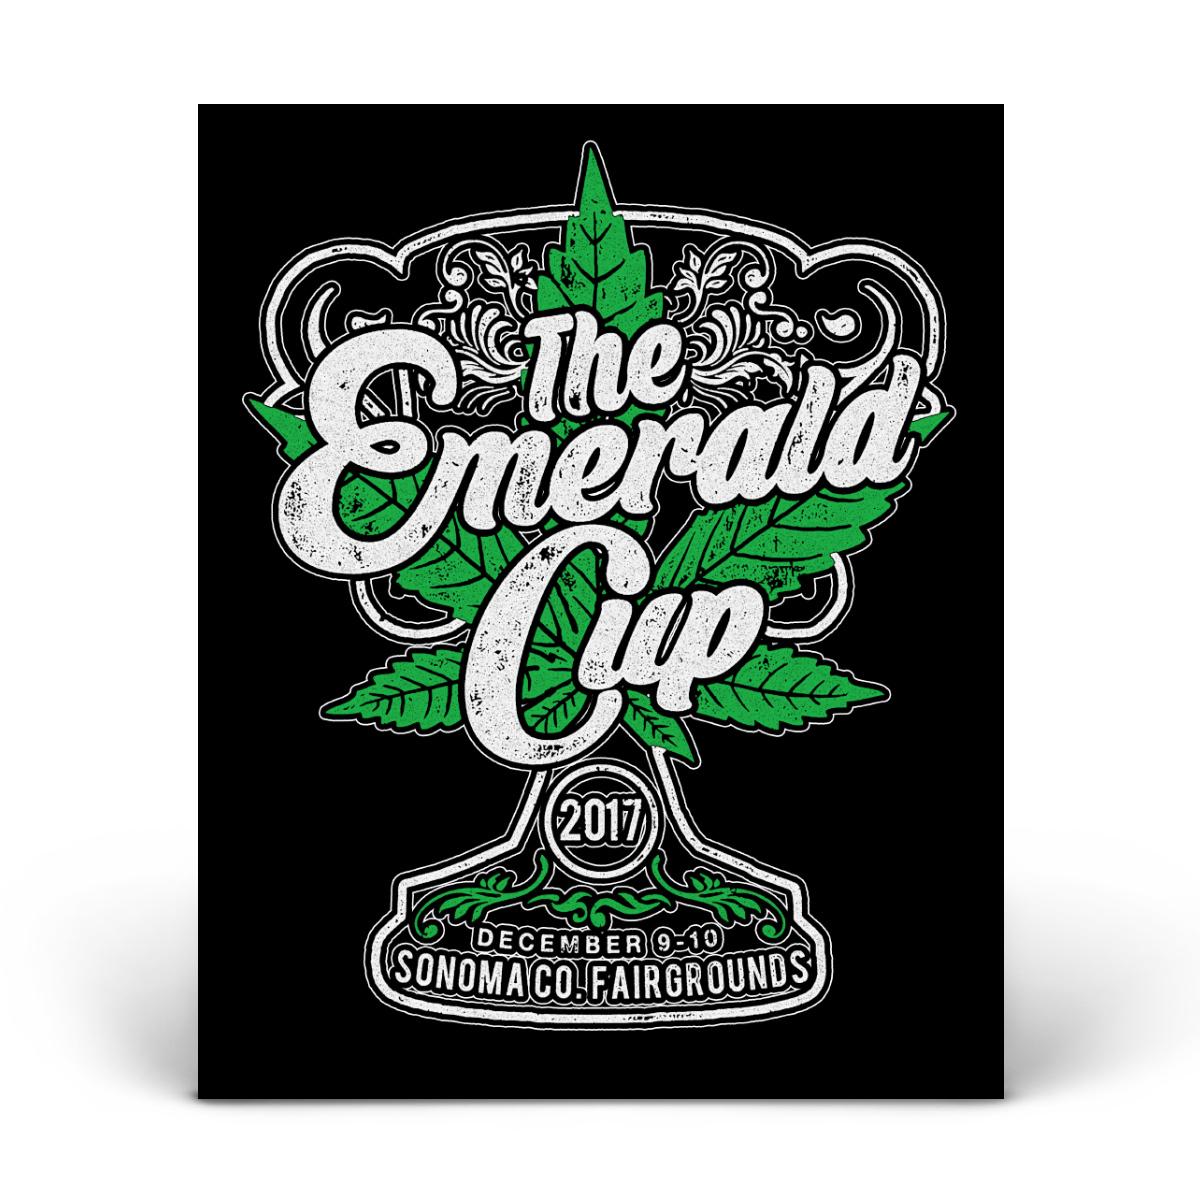 2017 Emerald Cup Event Sticker